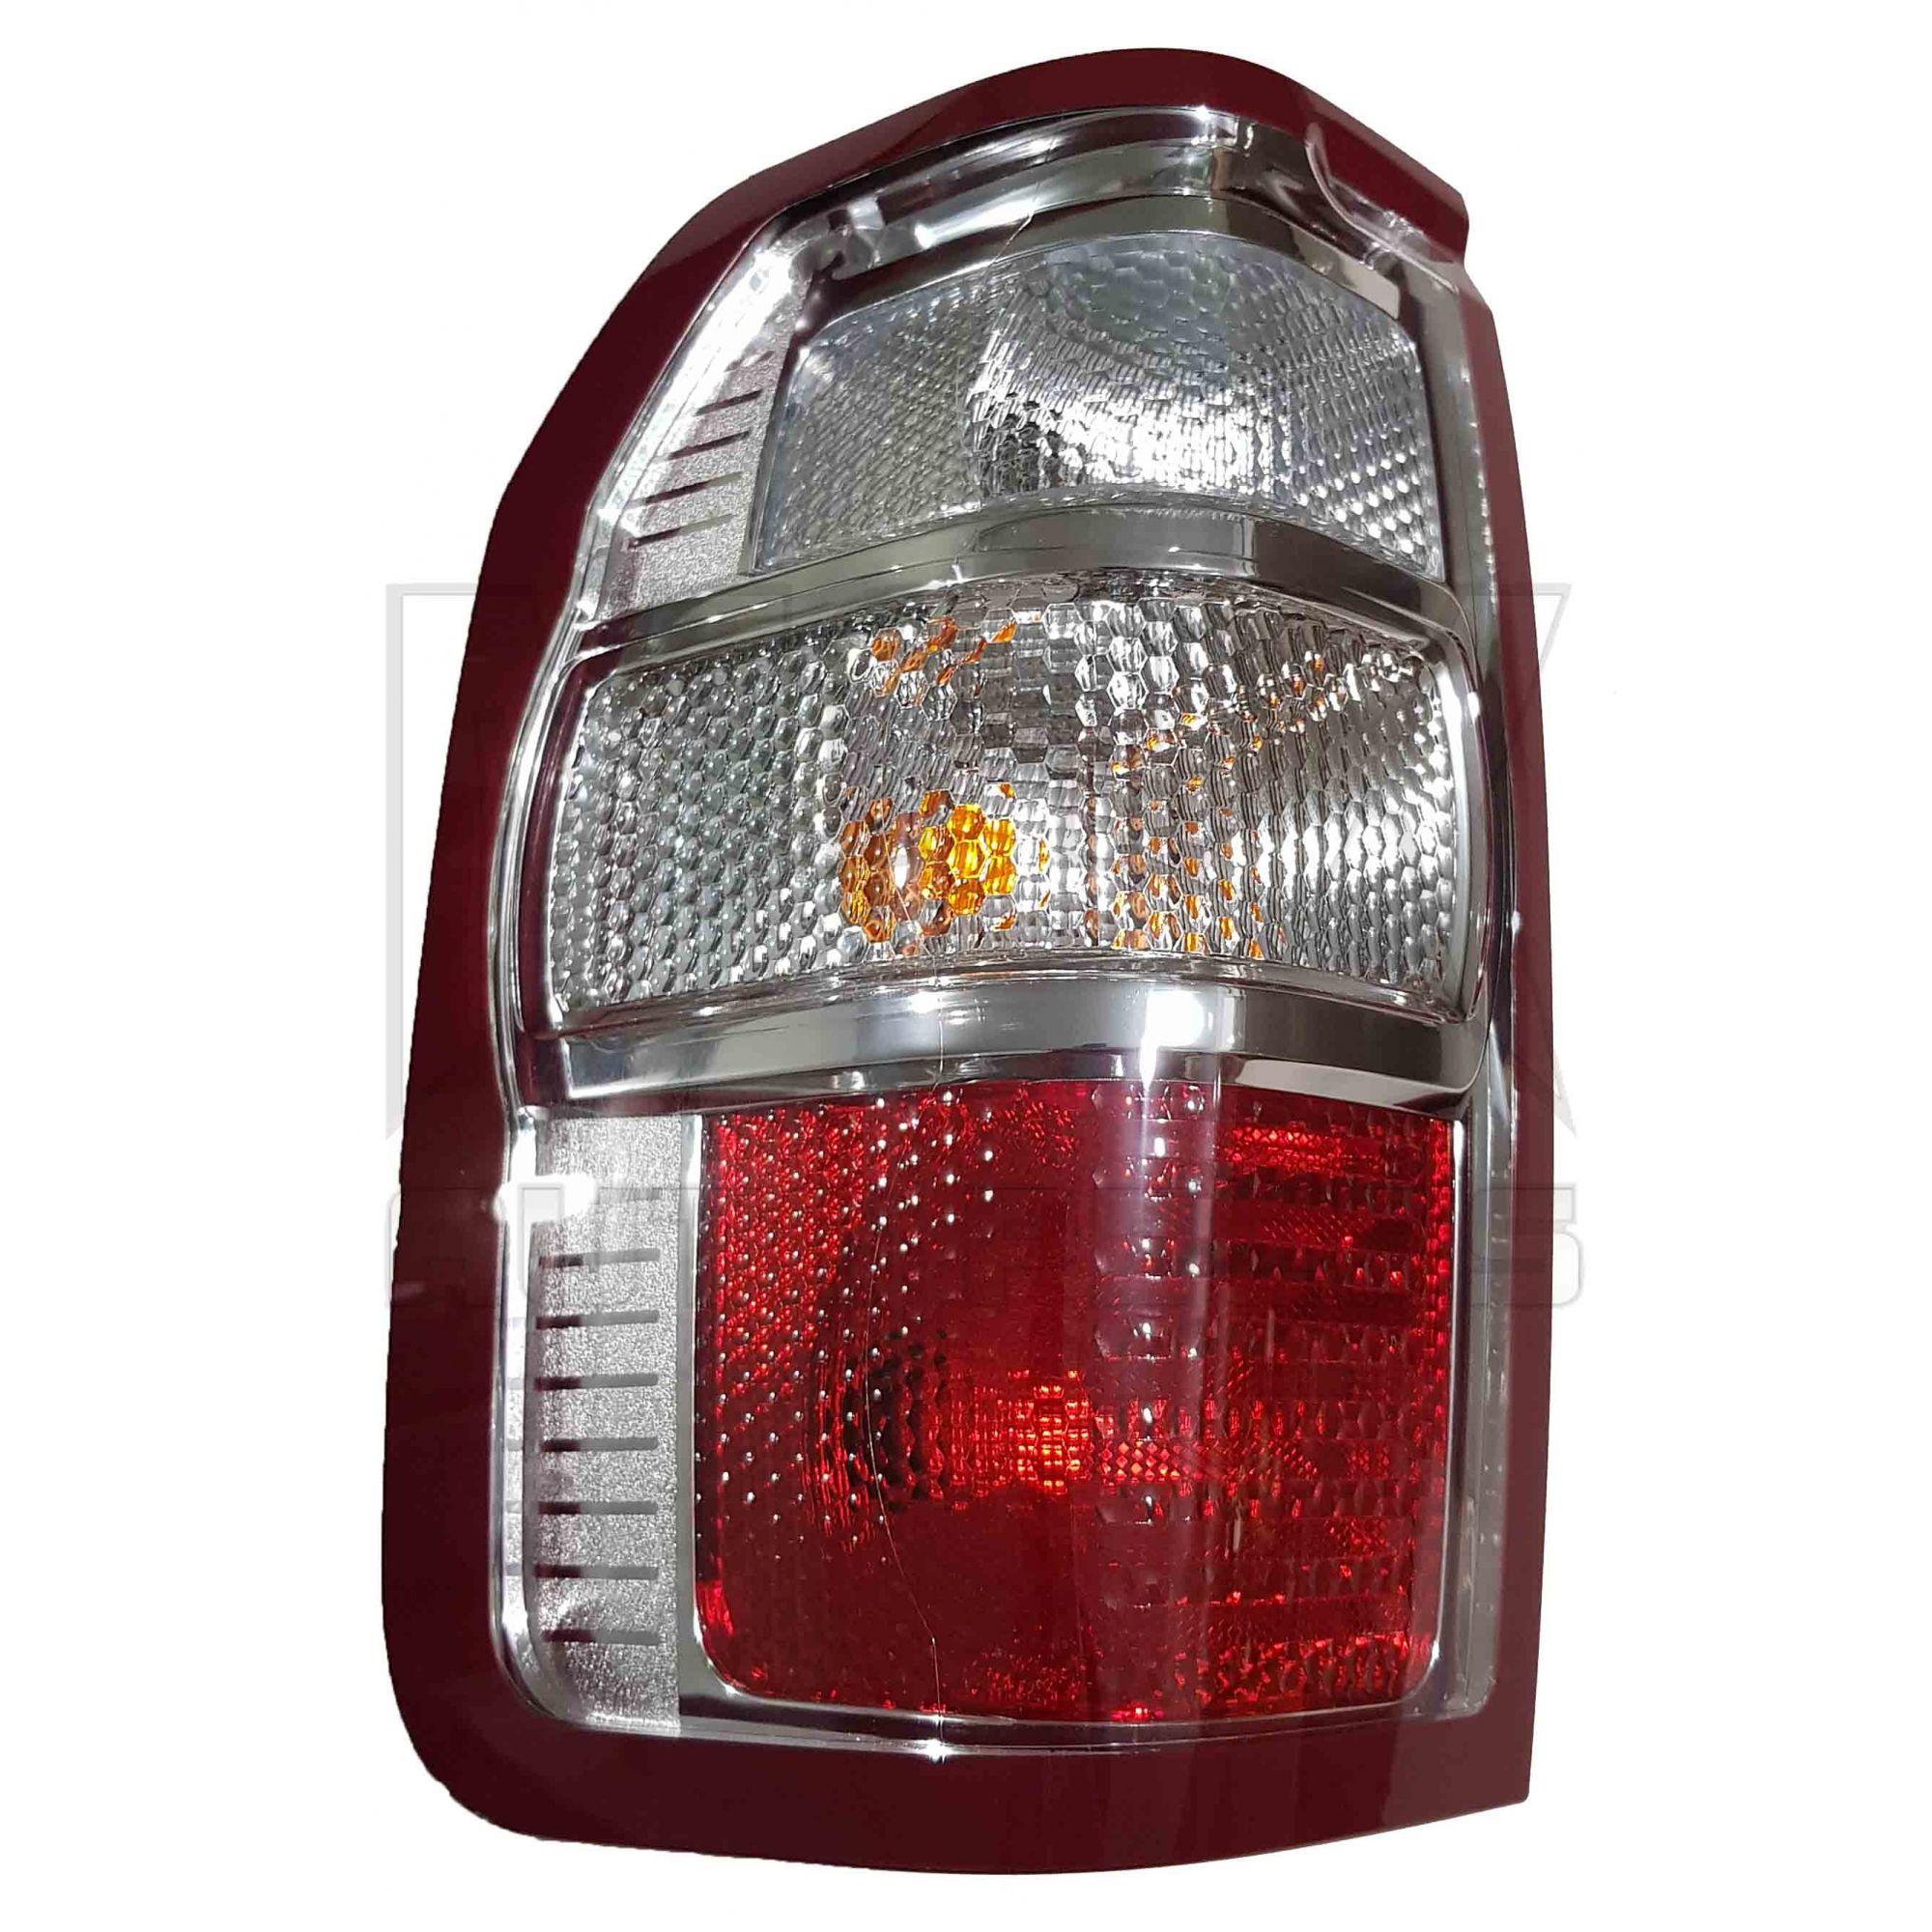 Lanterna Traseira Esquerda Ranger 2009 2010 à 2012 Original Ford